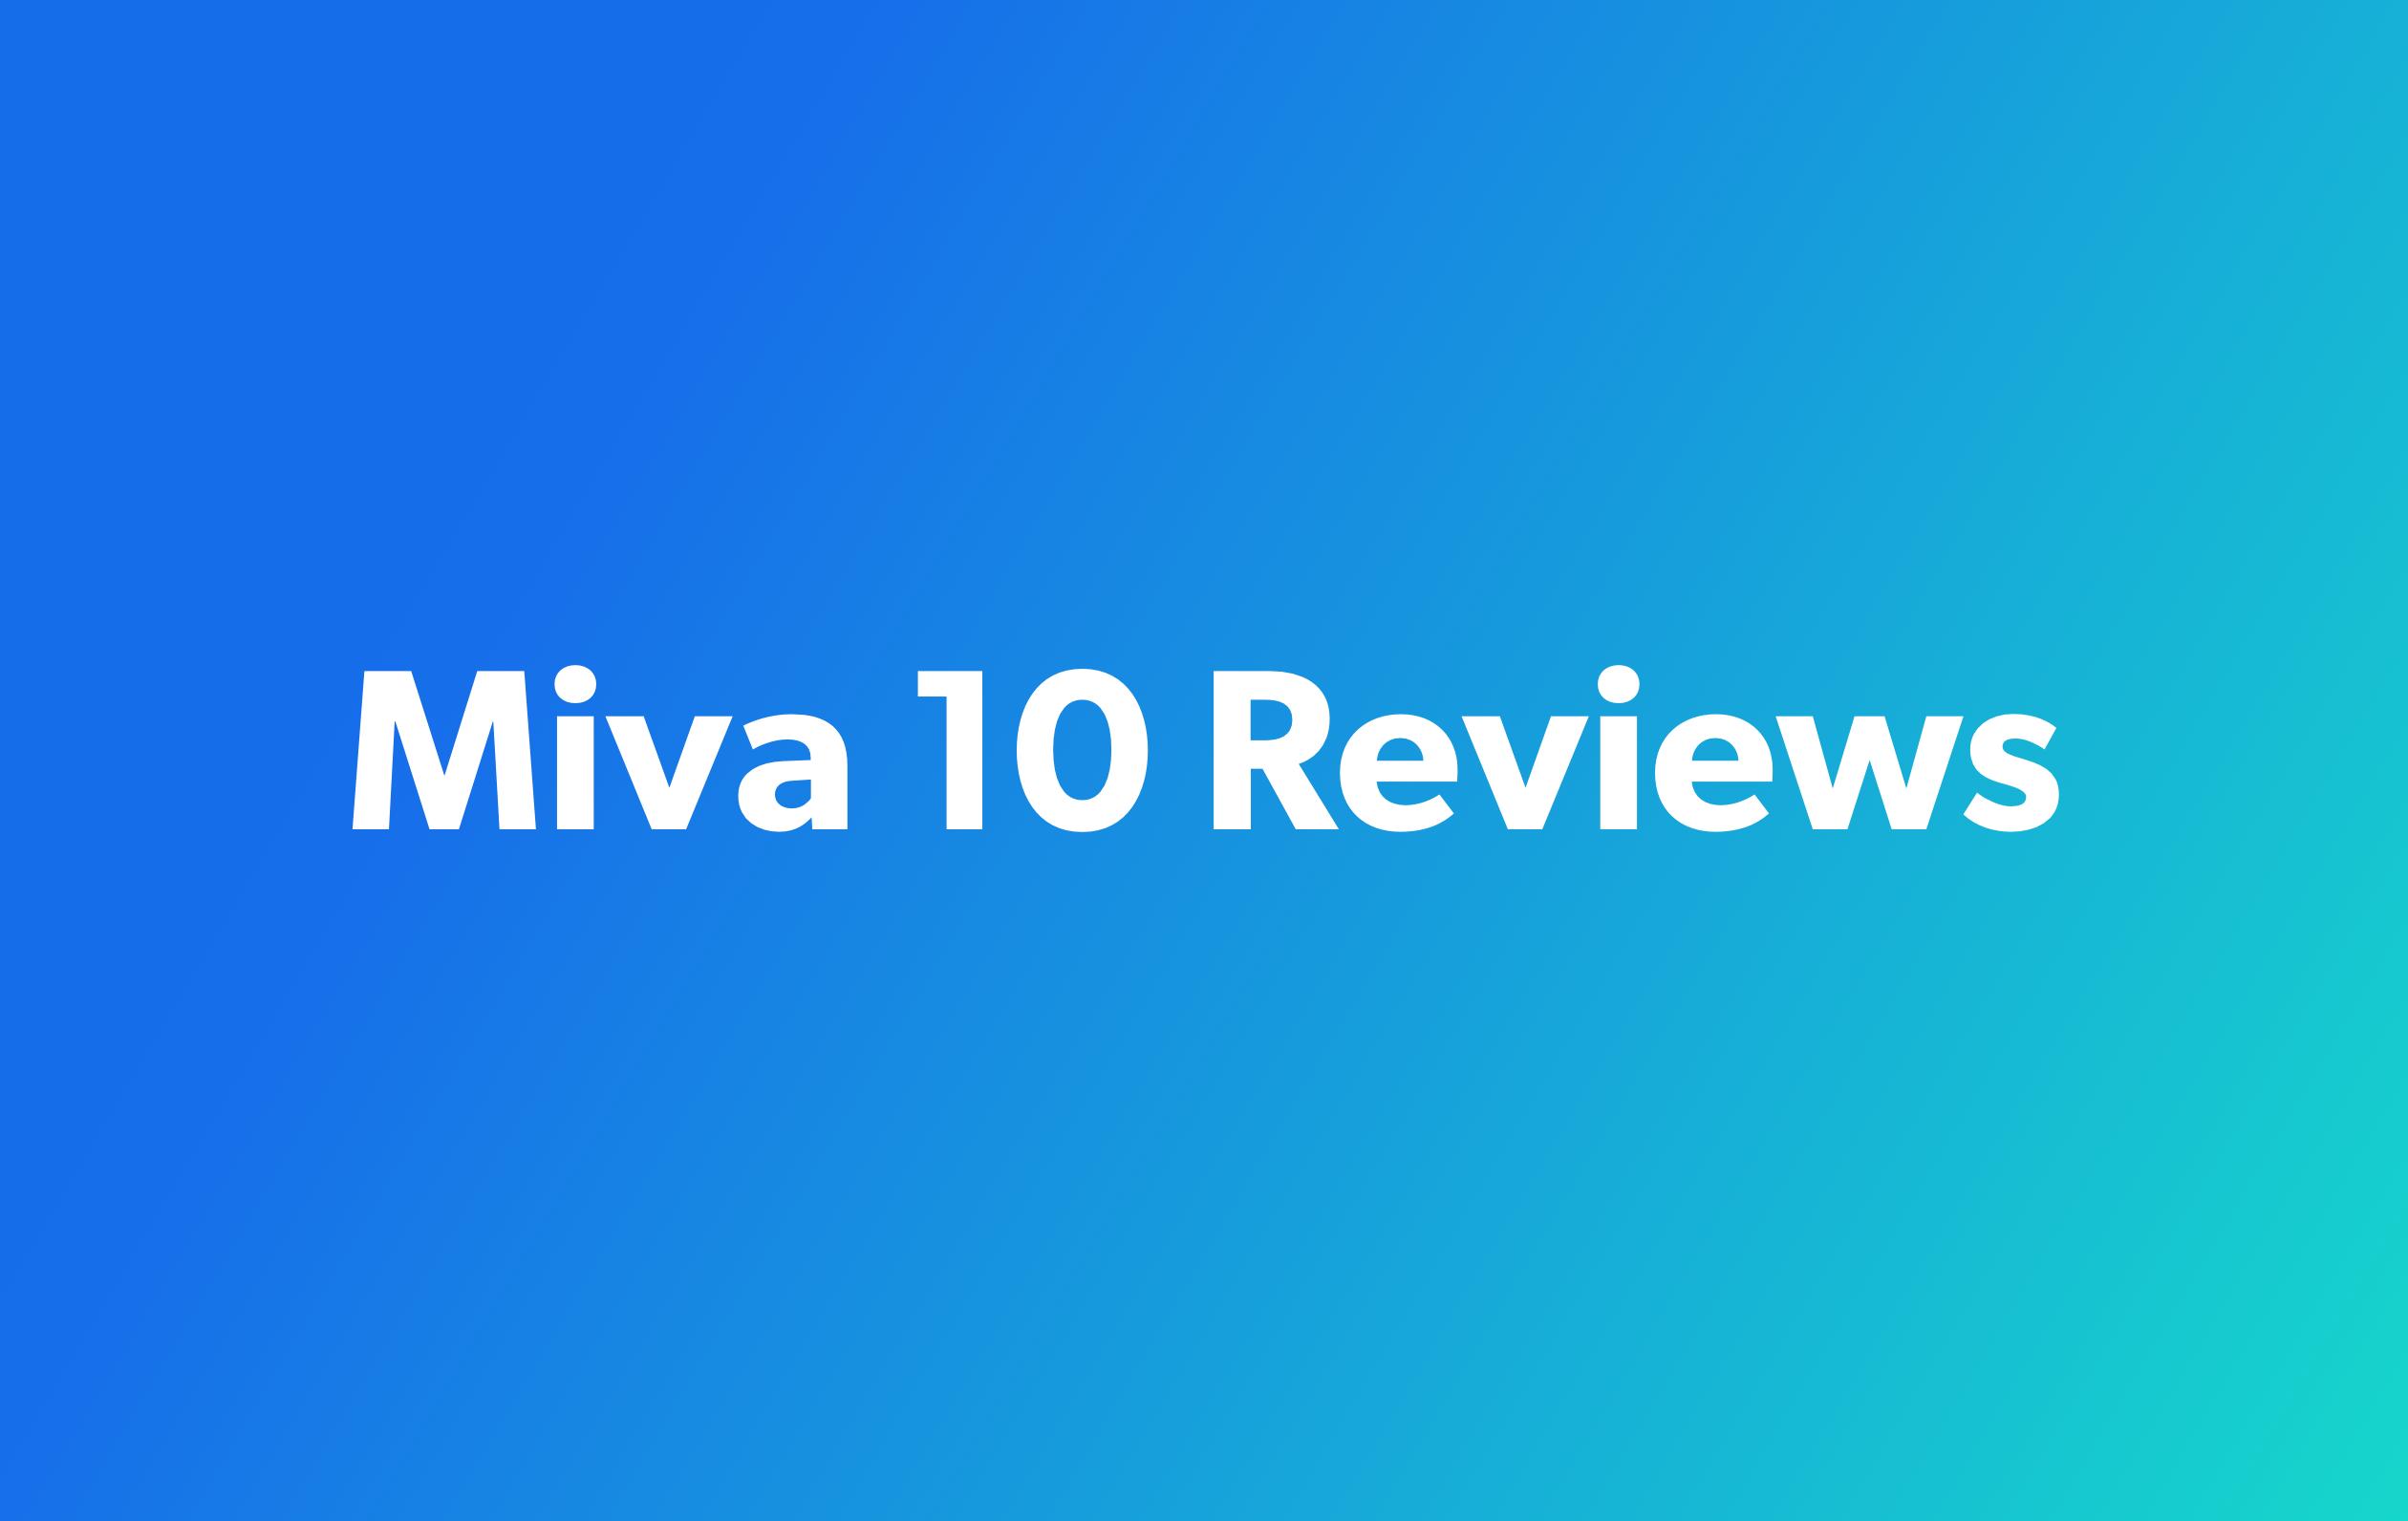 Miva 10 Reviews